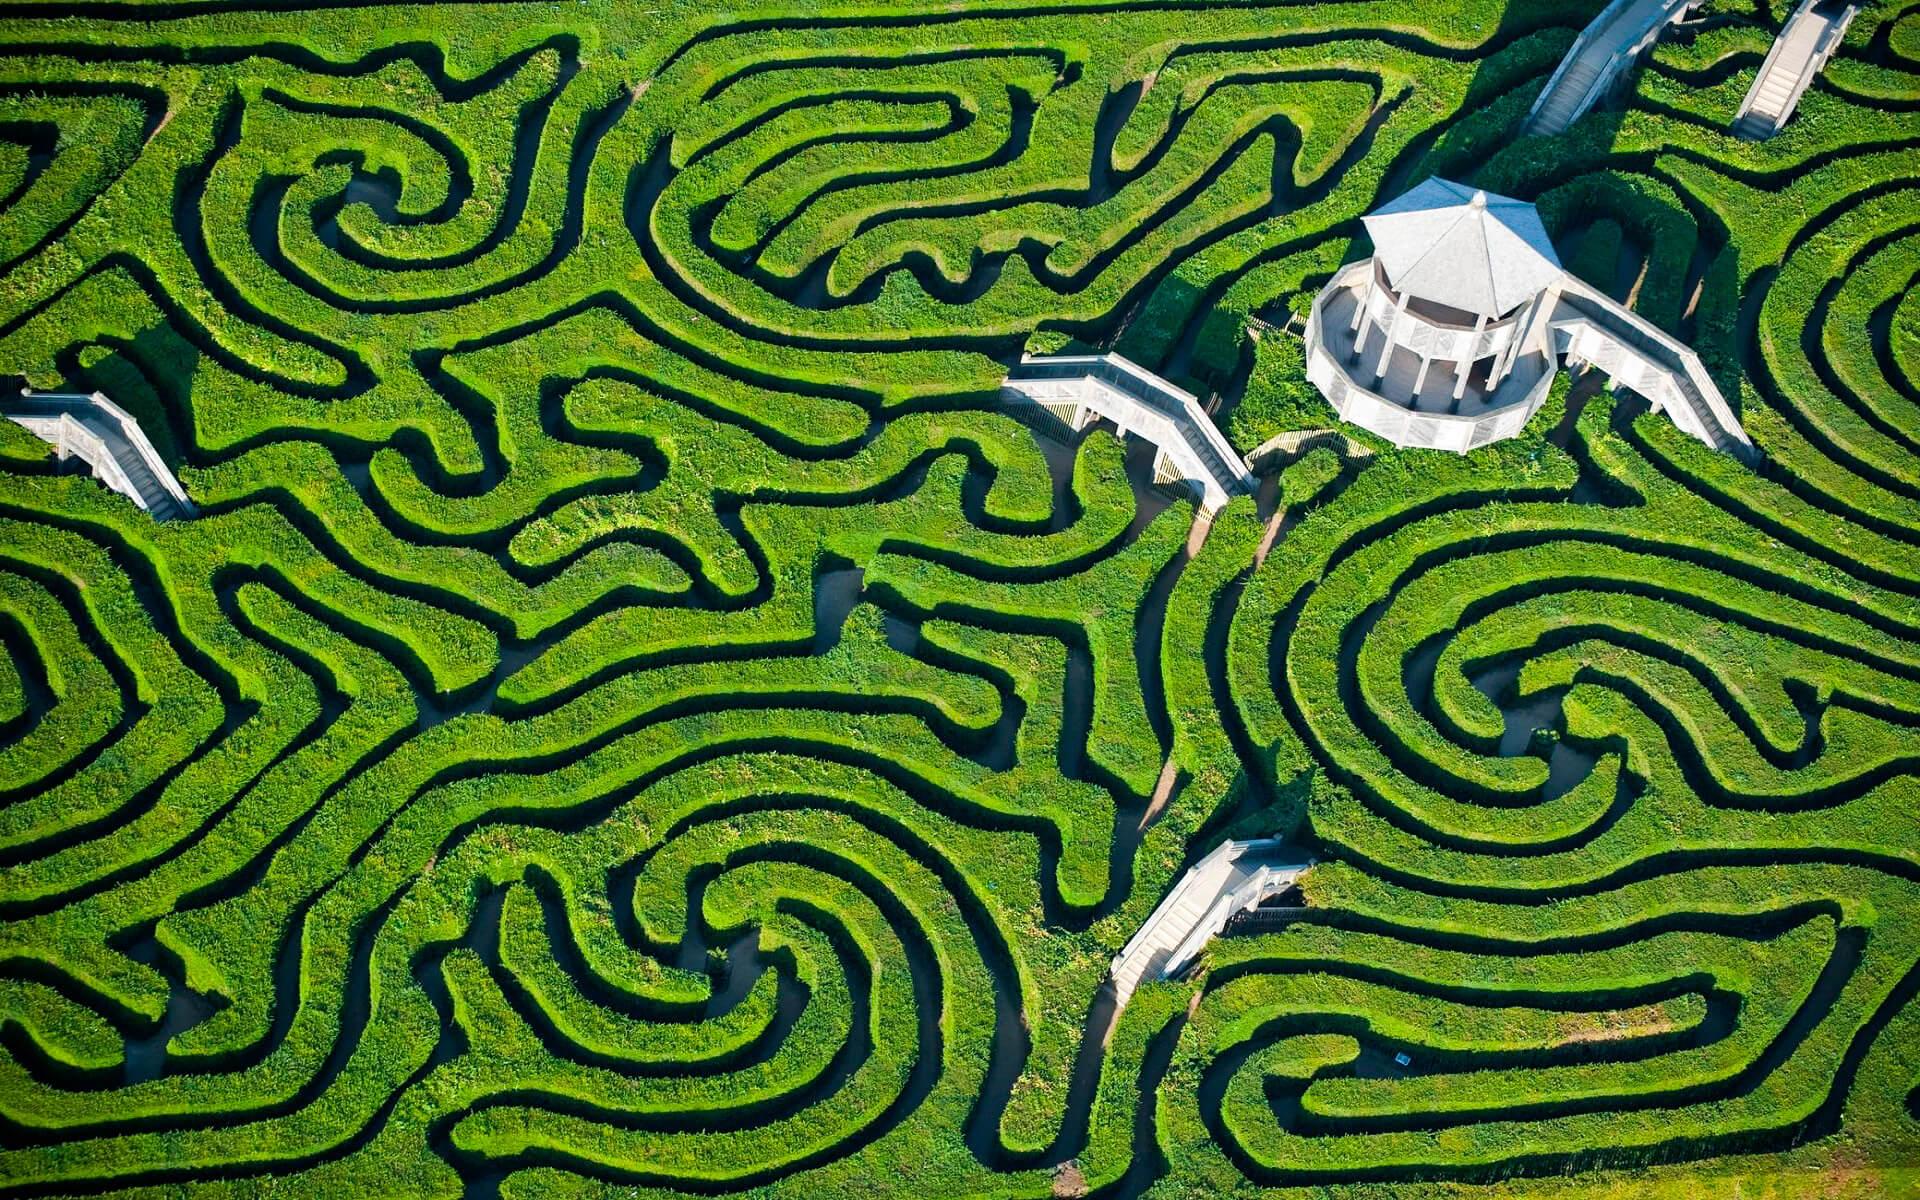 Longleat Labyrinth, England